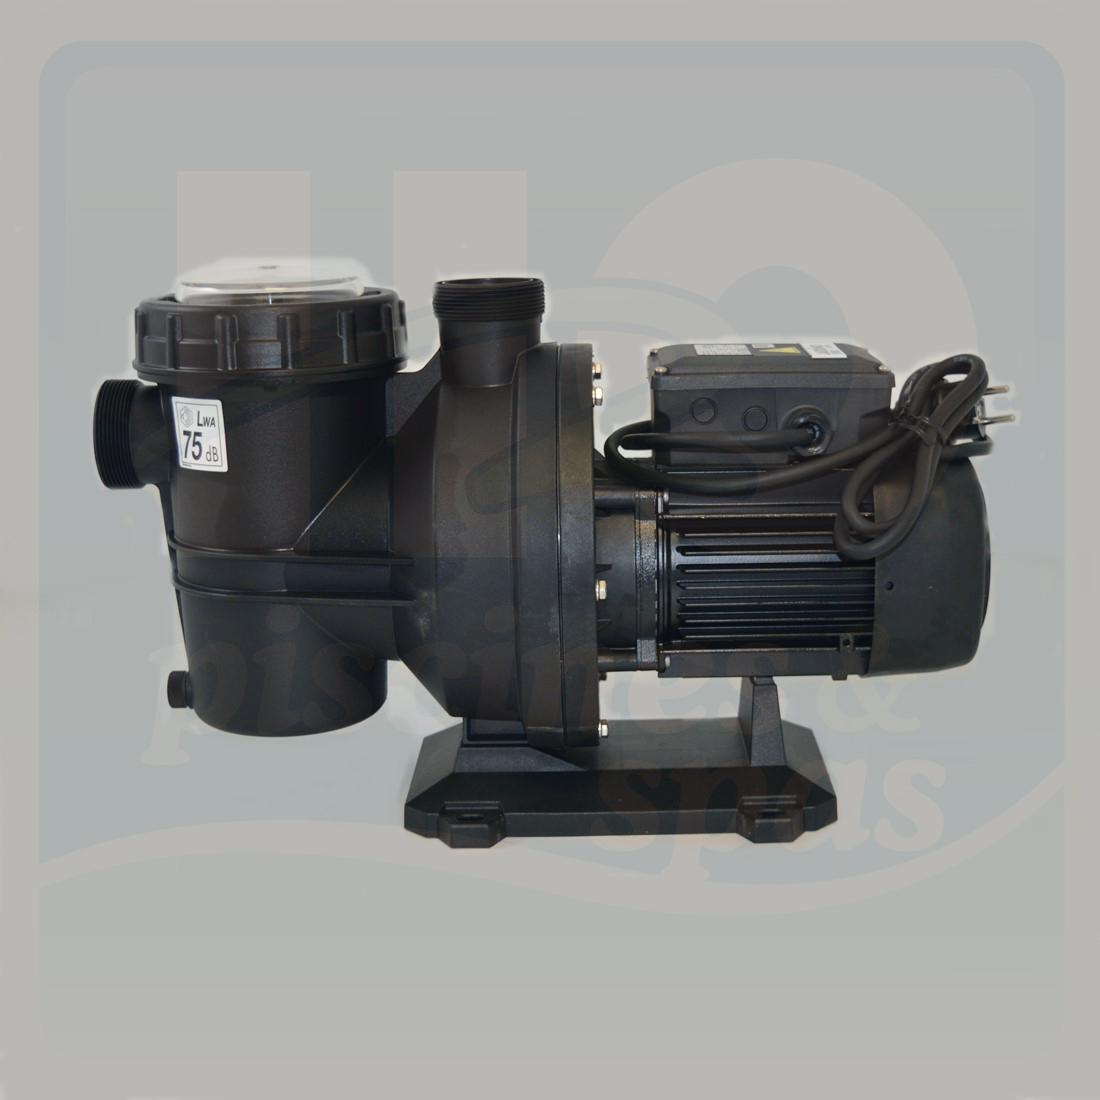 Pompe De Filtration Piscine Espa Nox 100 15 M - 10 M3/H - 220 V - H2O  Piscines & Spas encequiconcerne Pompe Piscine 10M3 H